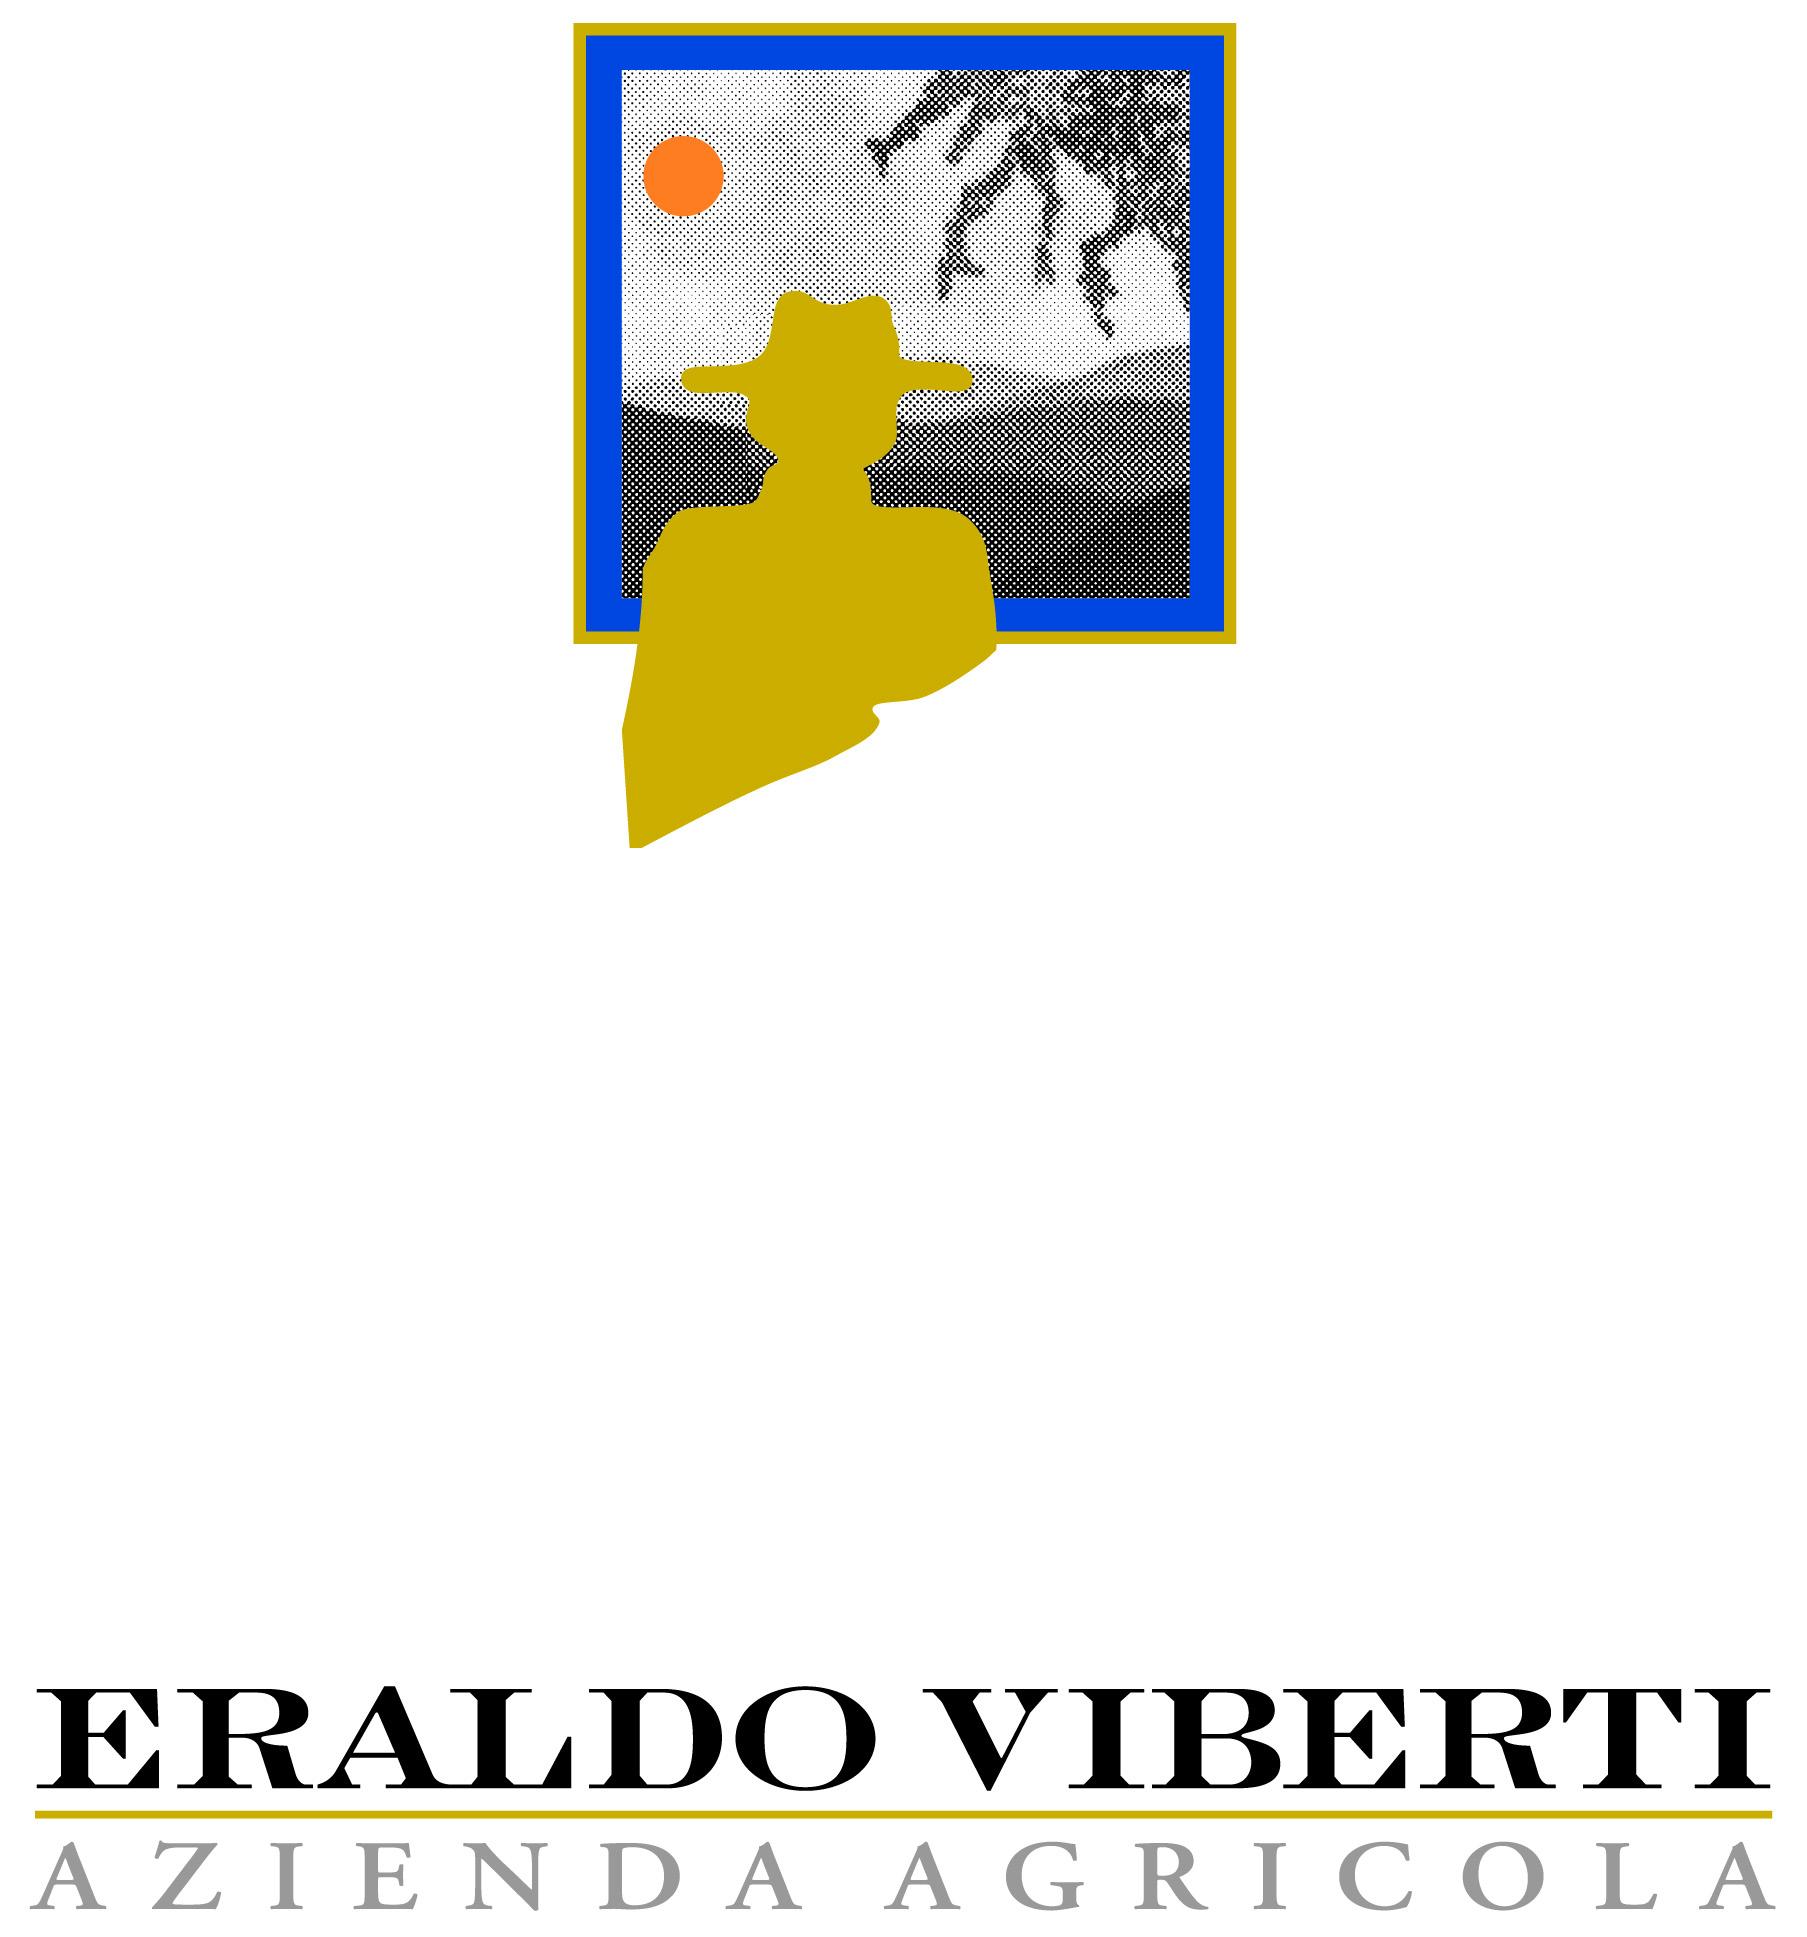 Eraldo Viberti